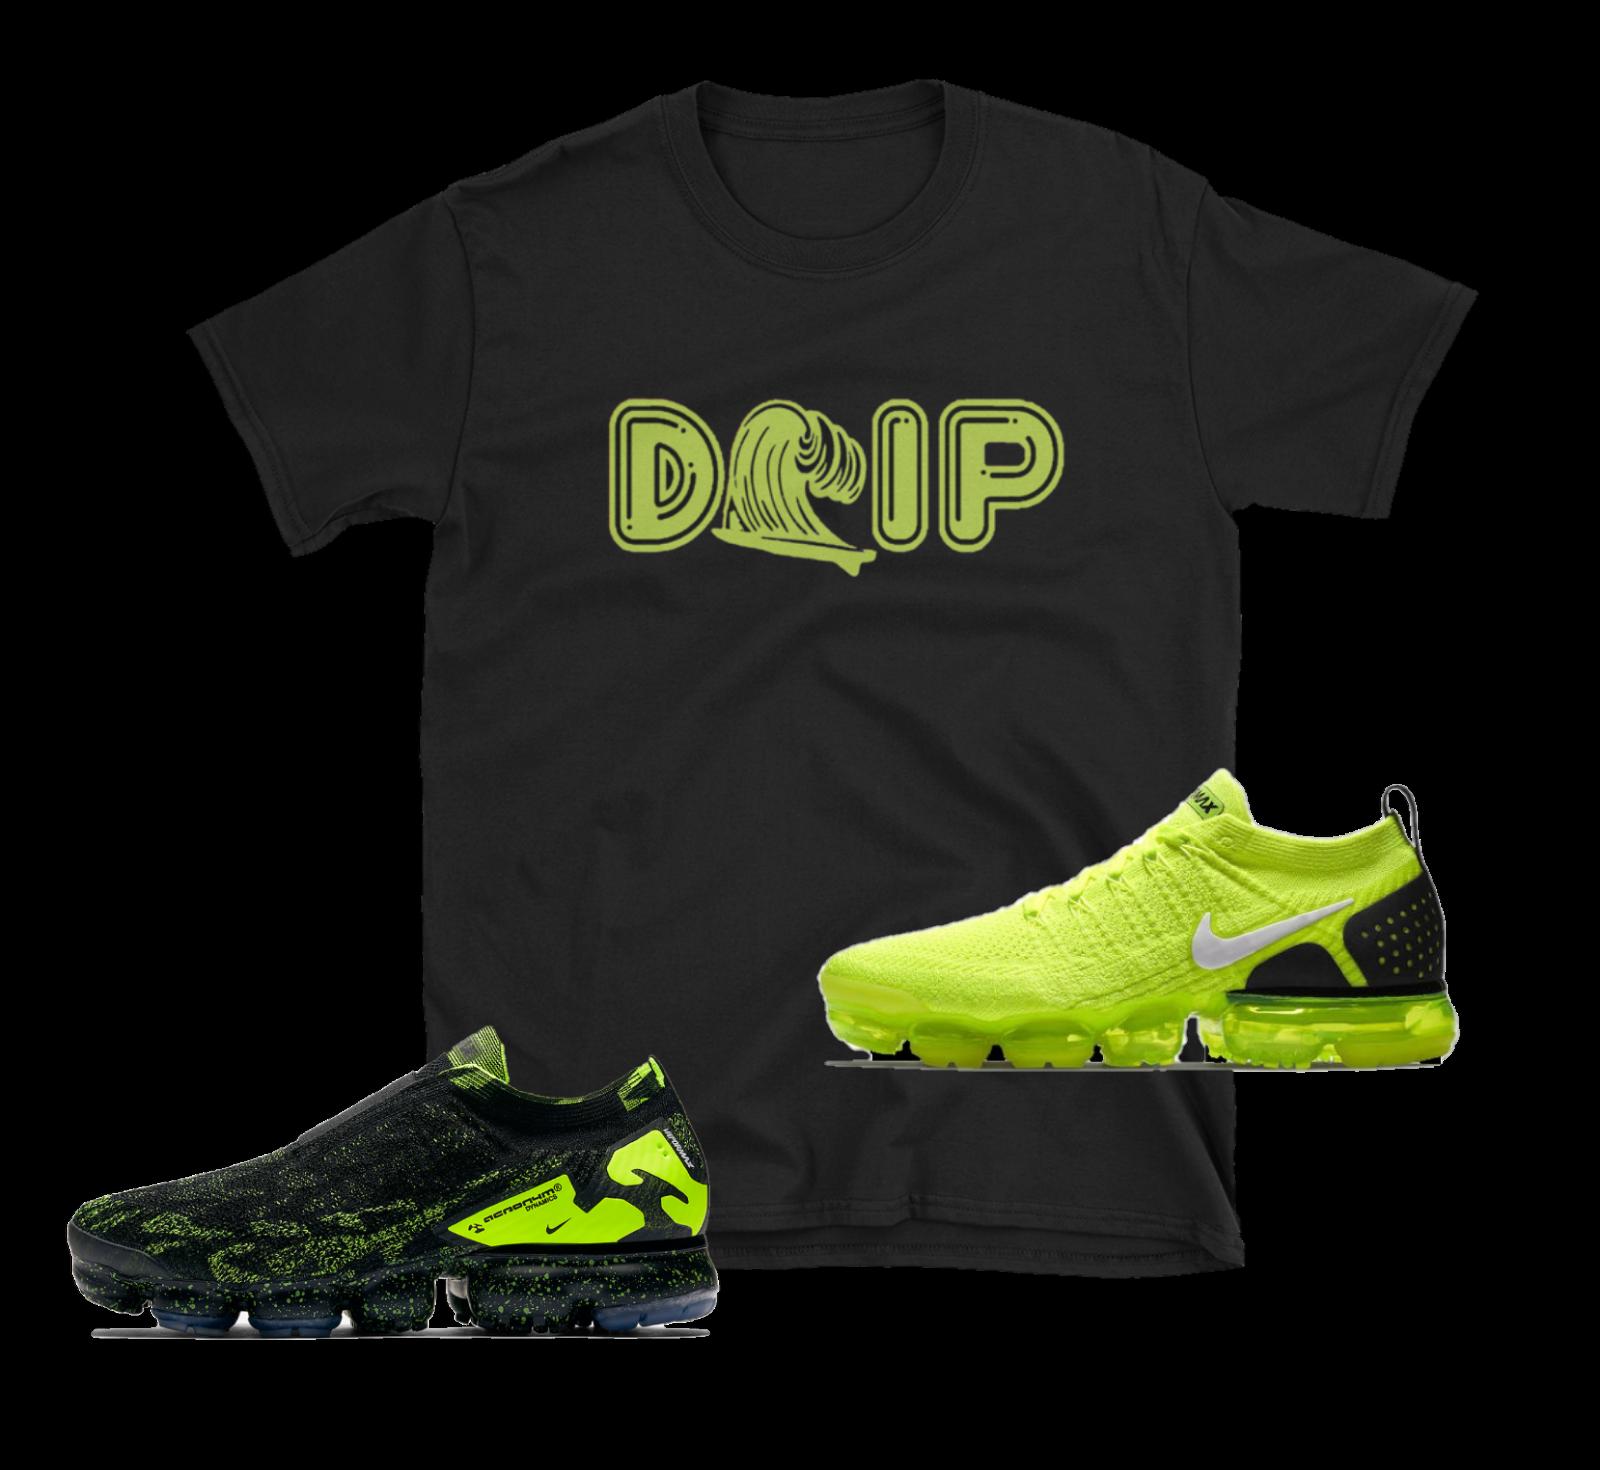 "Nike Airmax Plus Vapormax Flyknit 2 Air Max rövidítés Volt Neon Green \""DRIP\"" SHIRT"